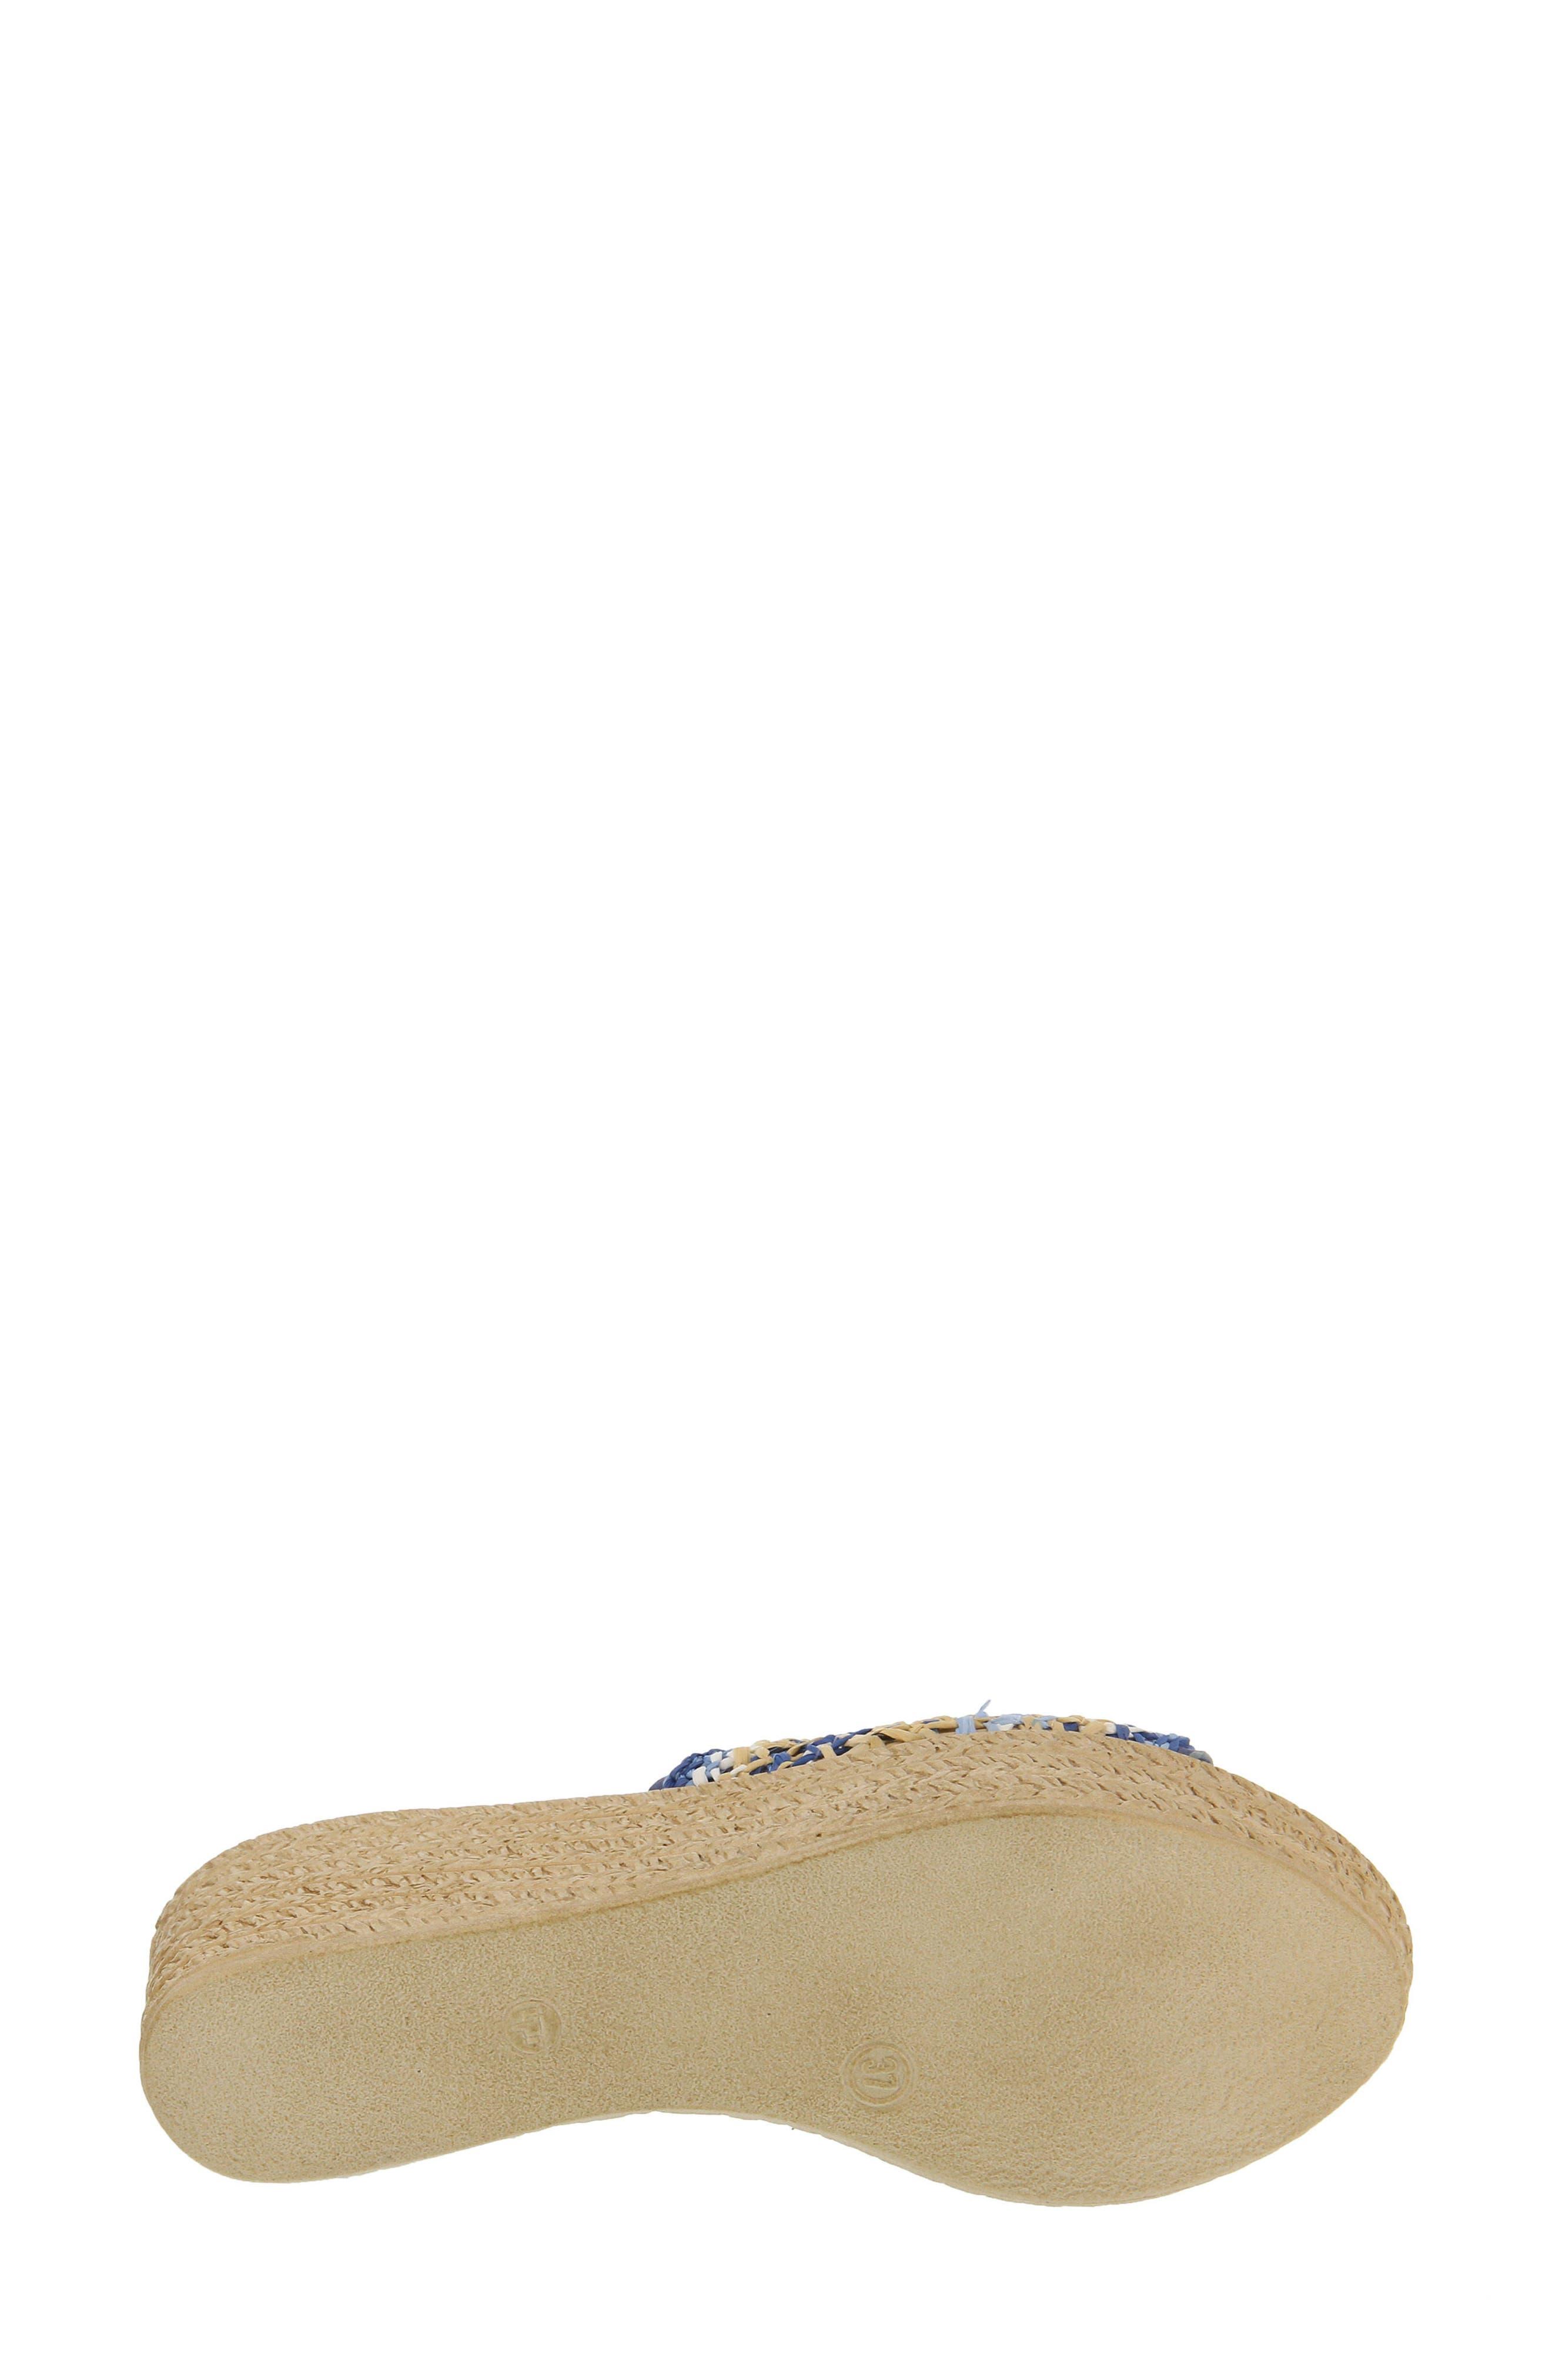 Calci Espadrille Wedge Sandal,                             Alternate thumbnail 15, color,